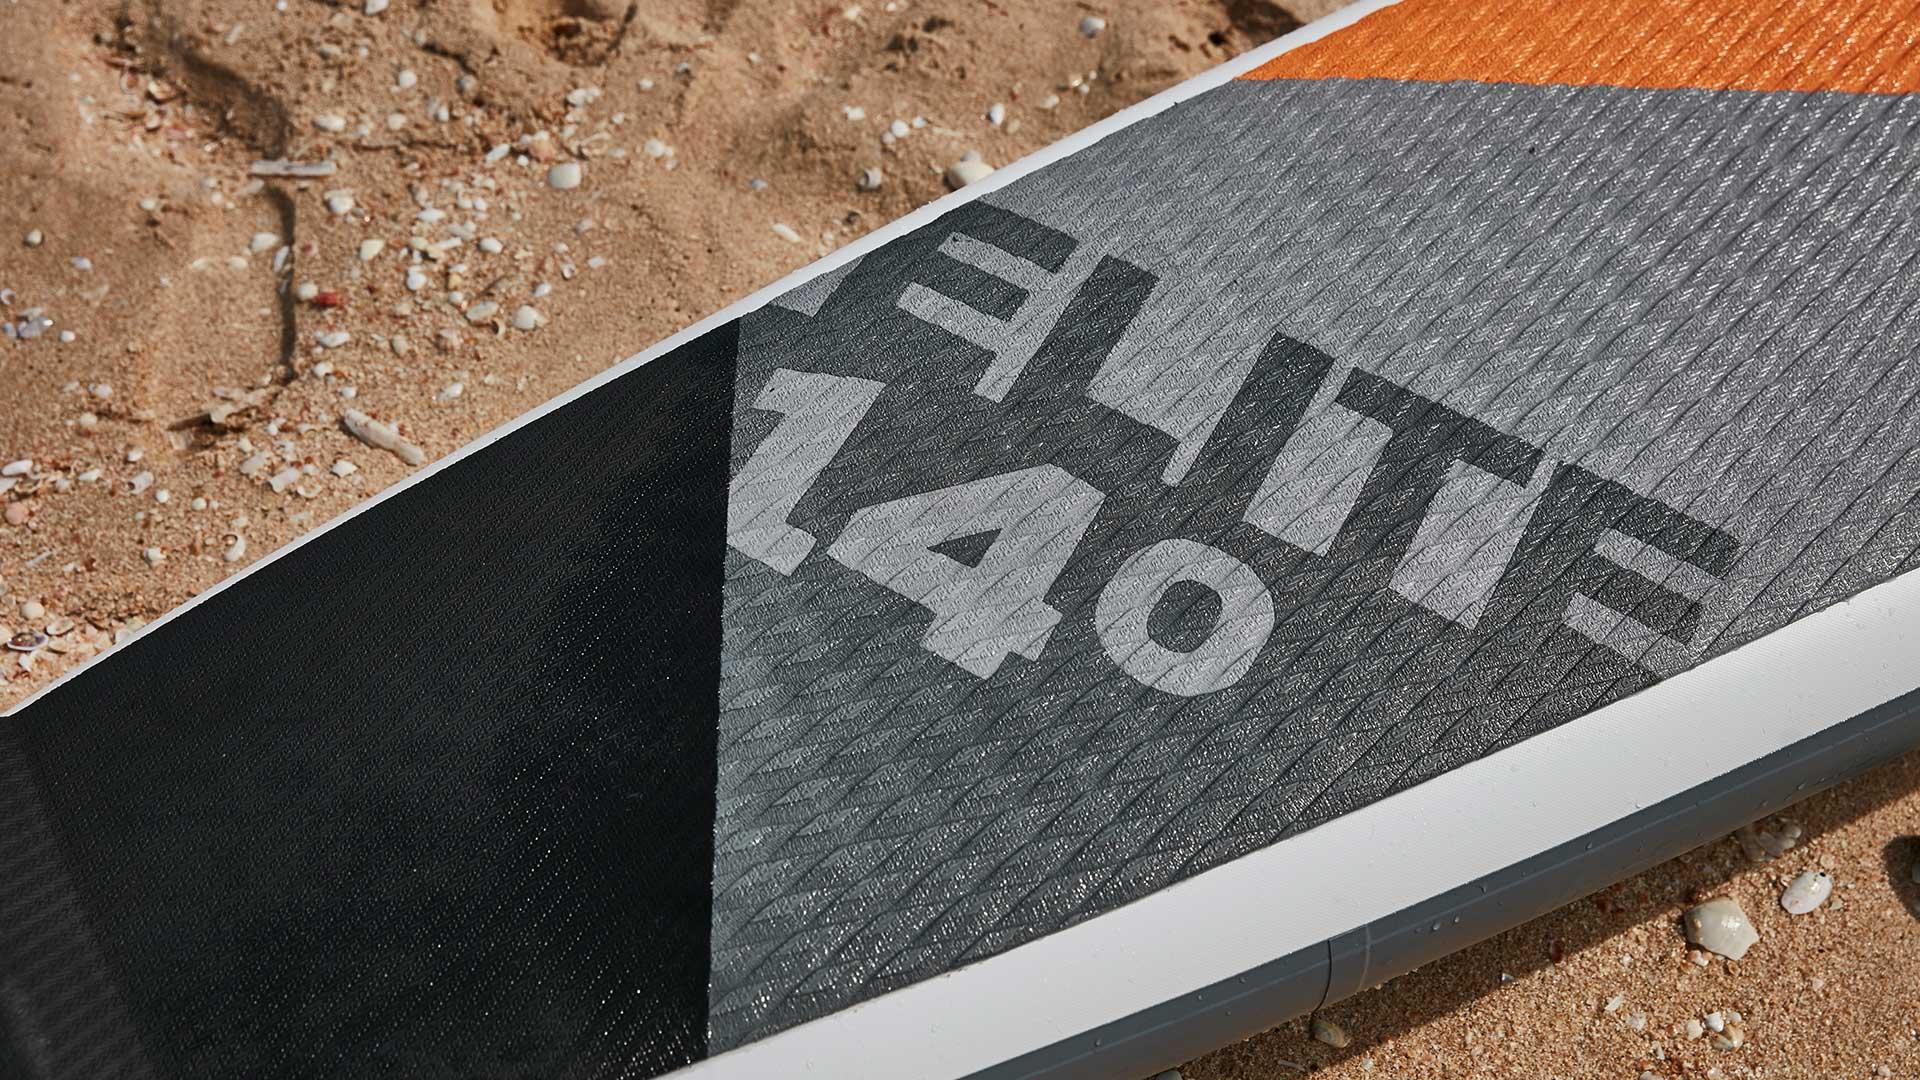 redpaddleco-140x27-elite-inflatable-paddle-board-desktop-gallery-deckpad